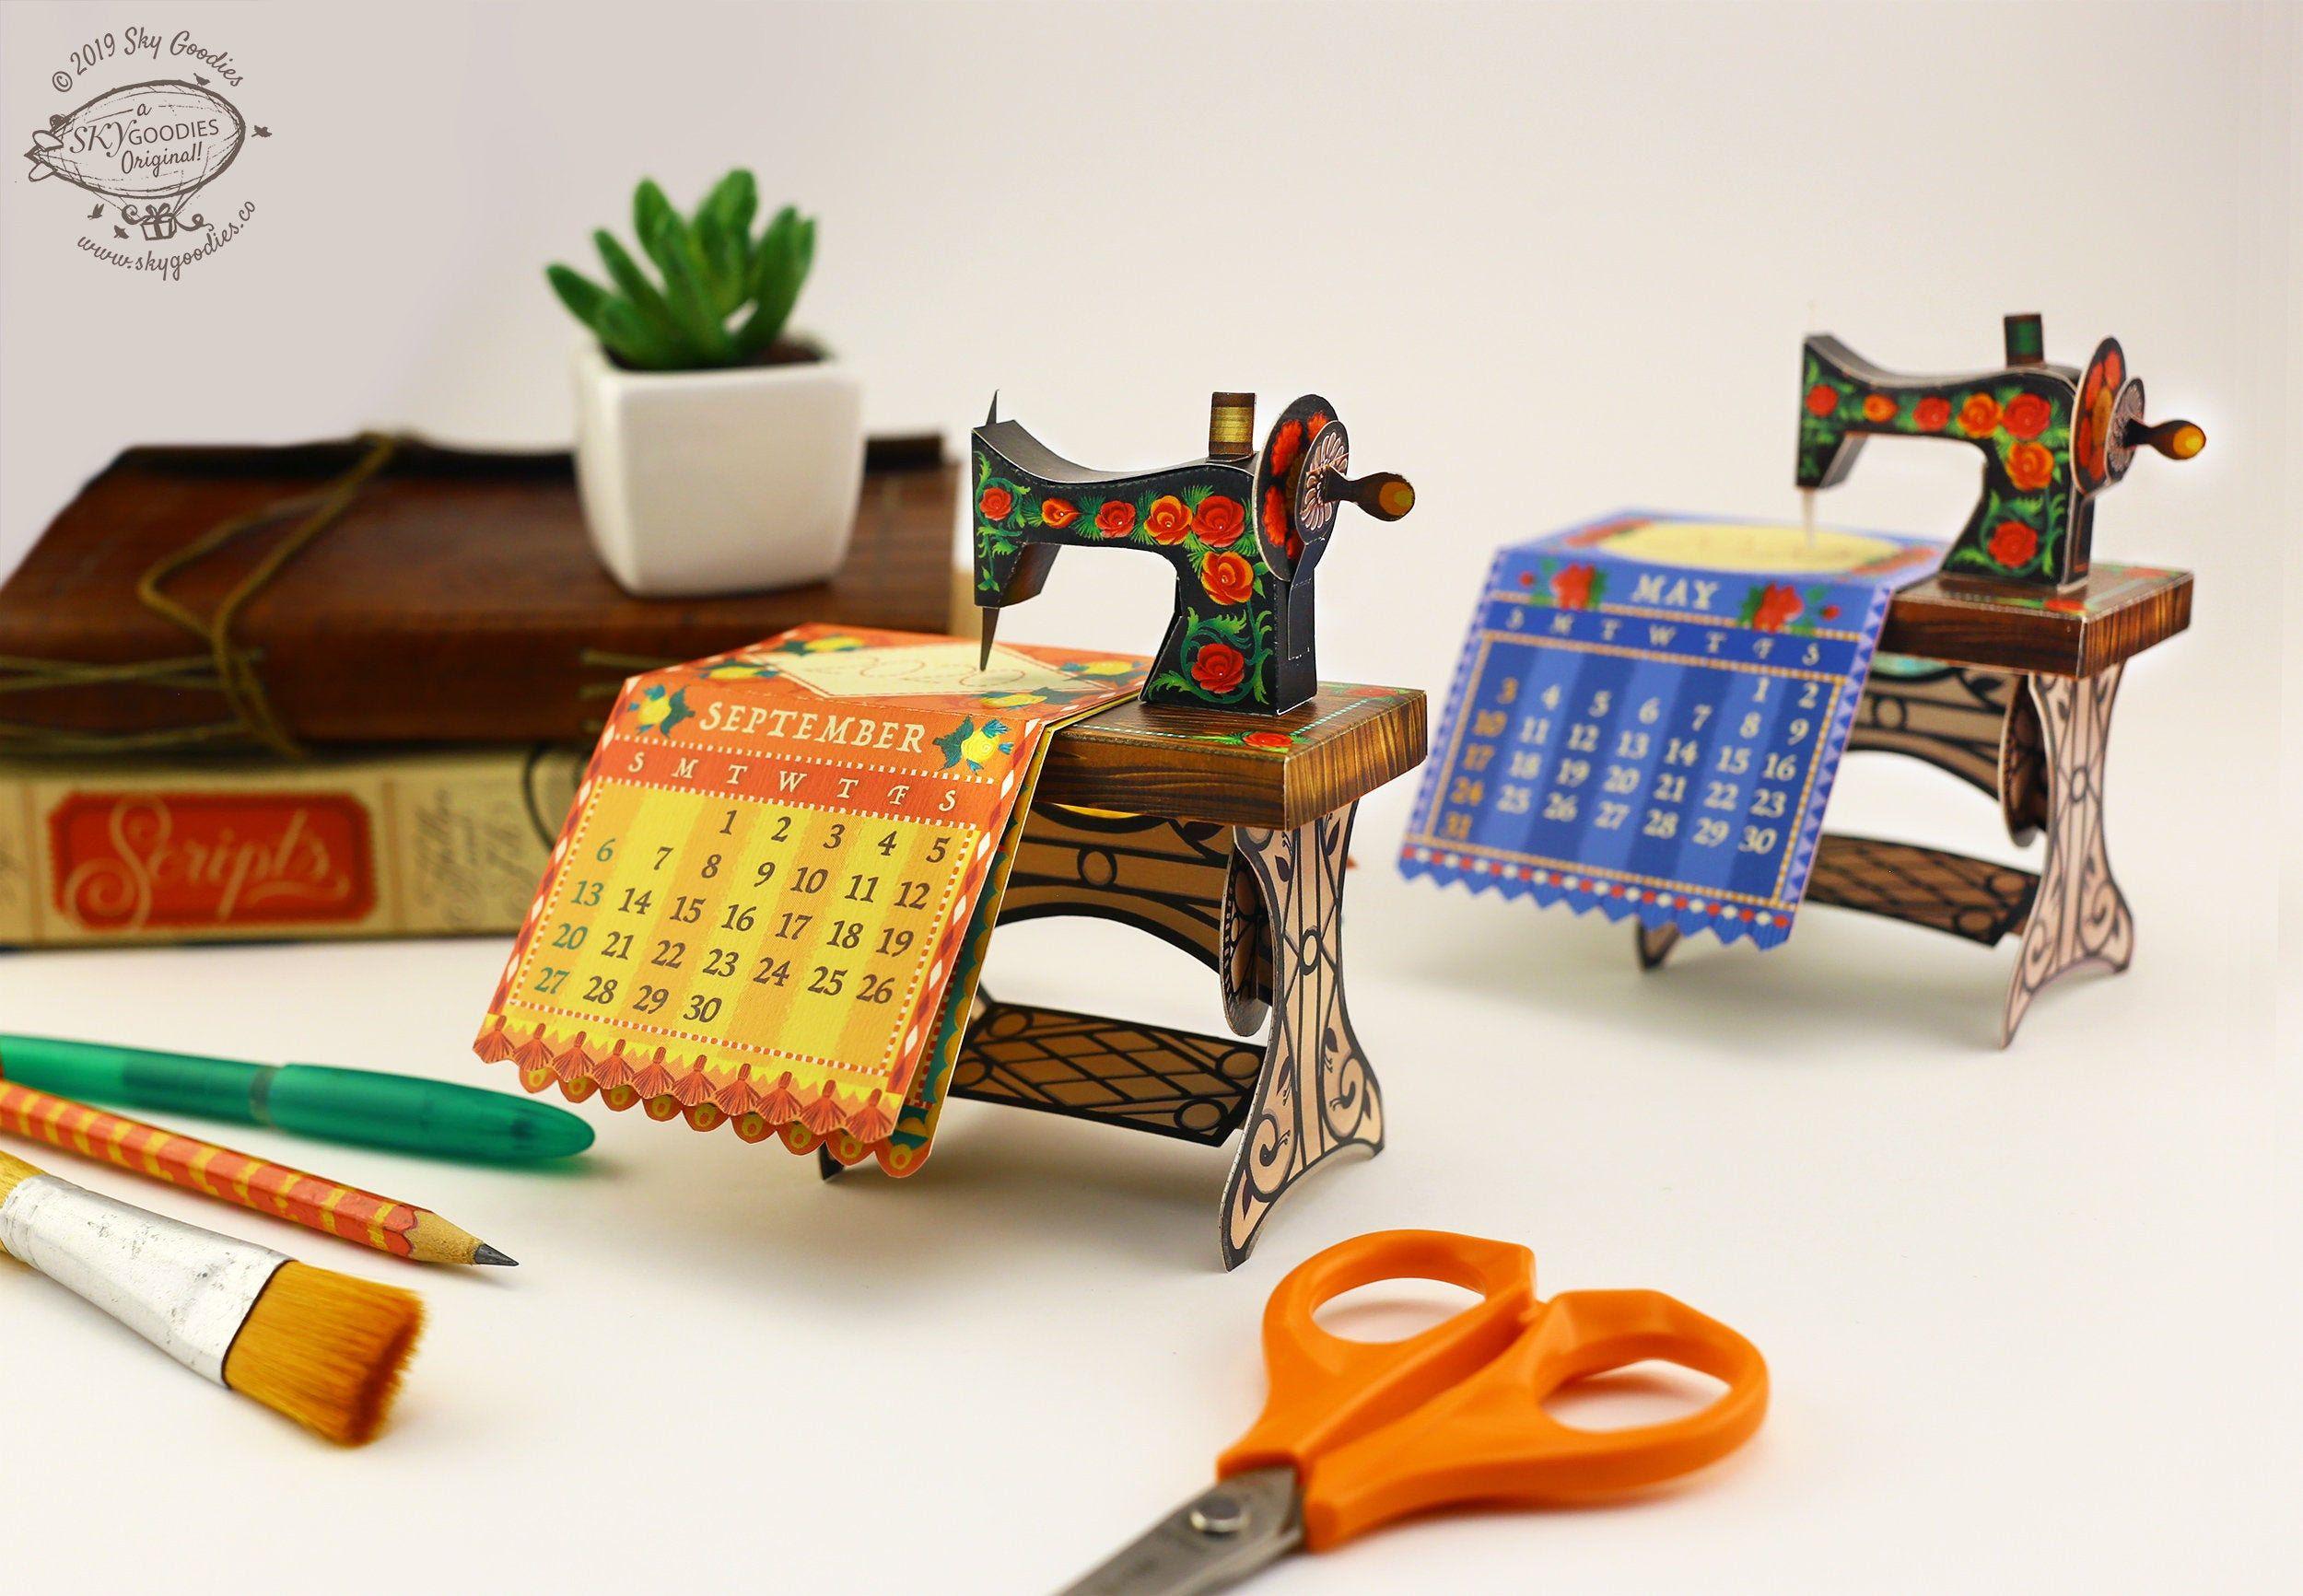 2021 Diy Sewing Machine Calendar Printable Paper Papercraft Etsy Paper Crafts Diy Diy Sewing Diy Desk Calendar